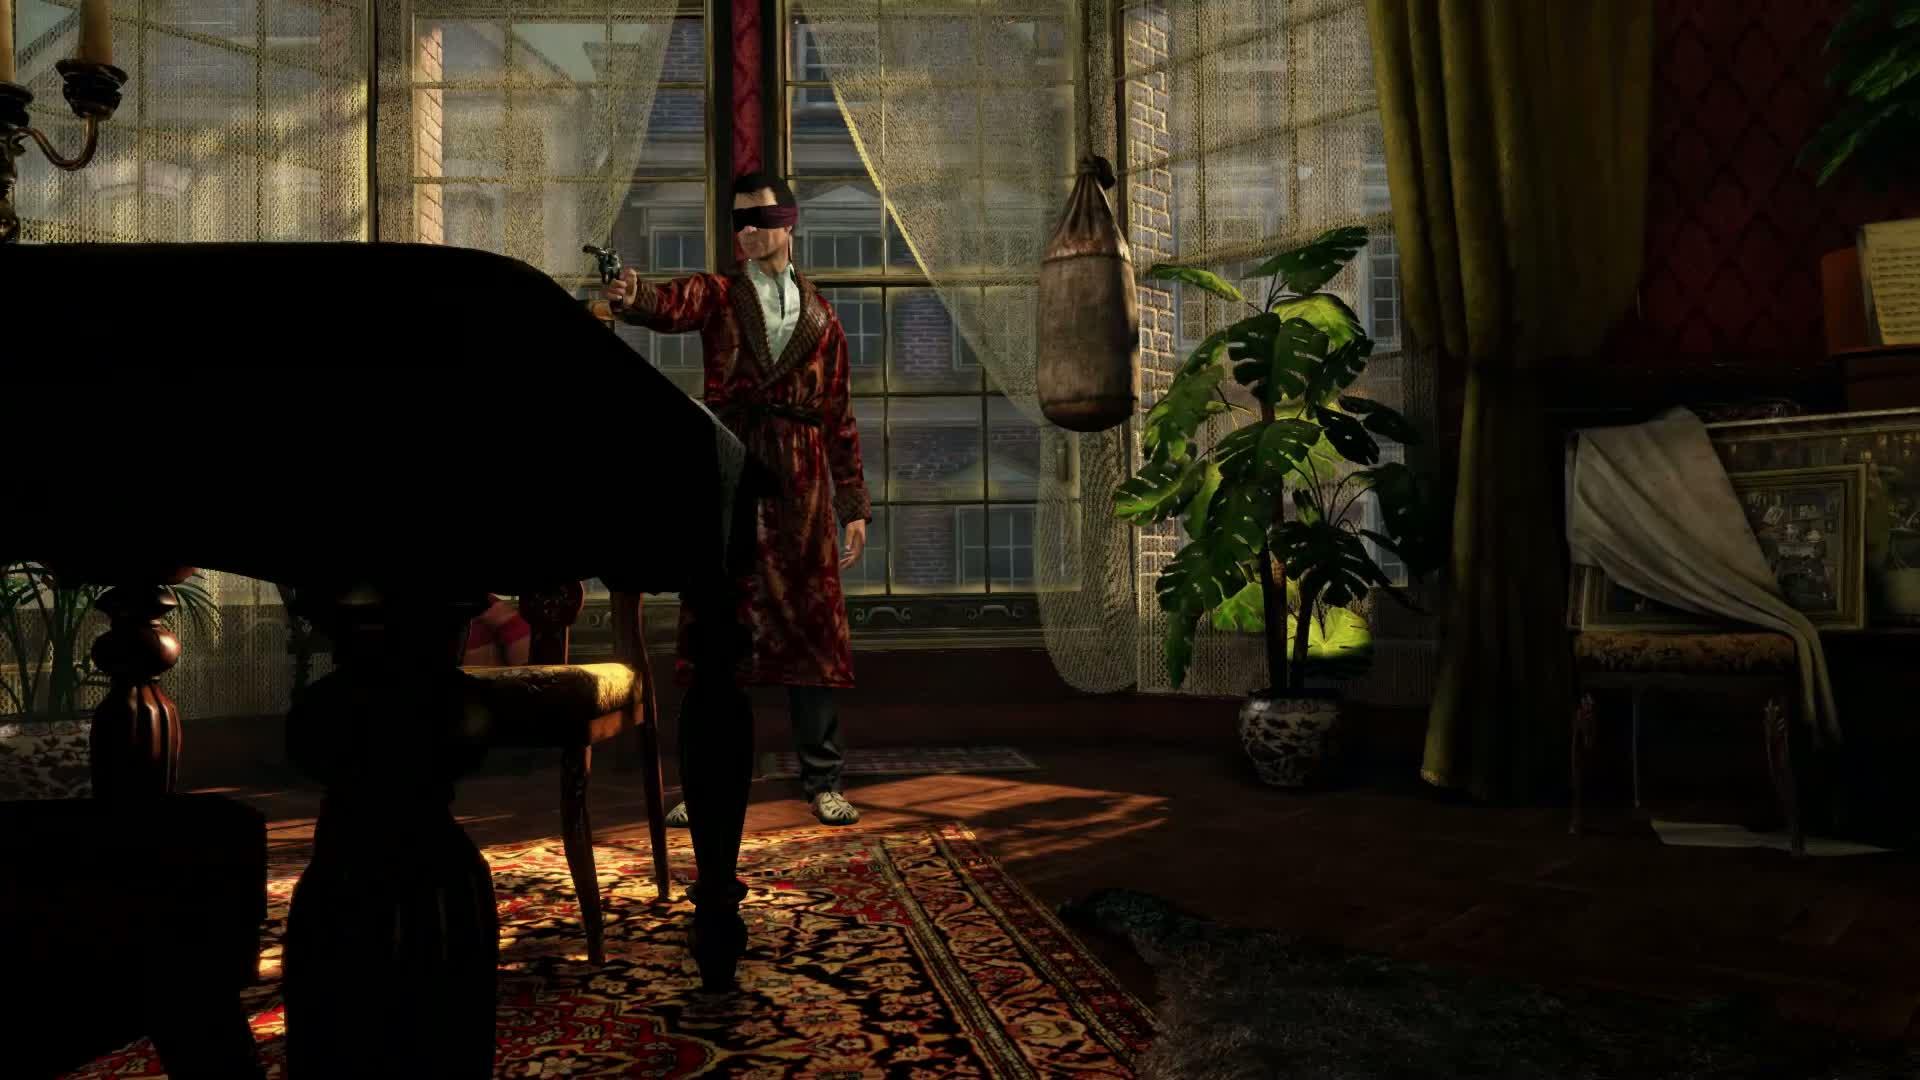 Sherlock-Focused Trailer   Crimes & Punishments